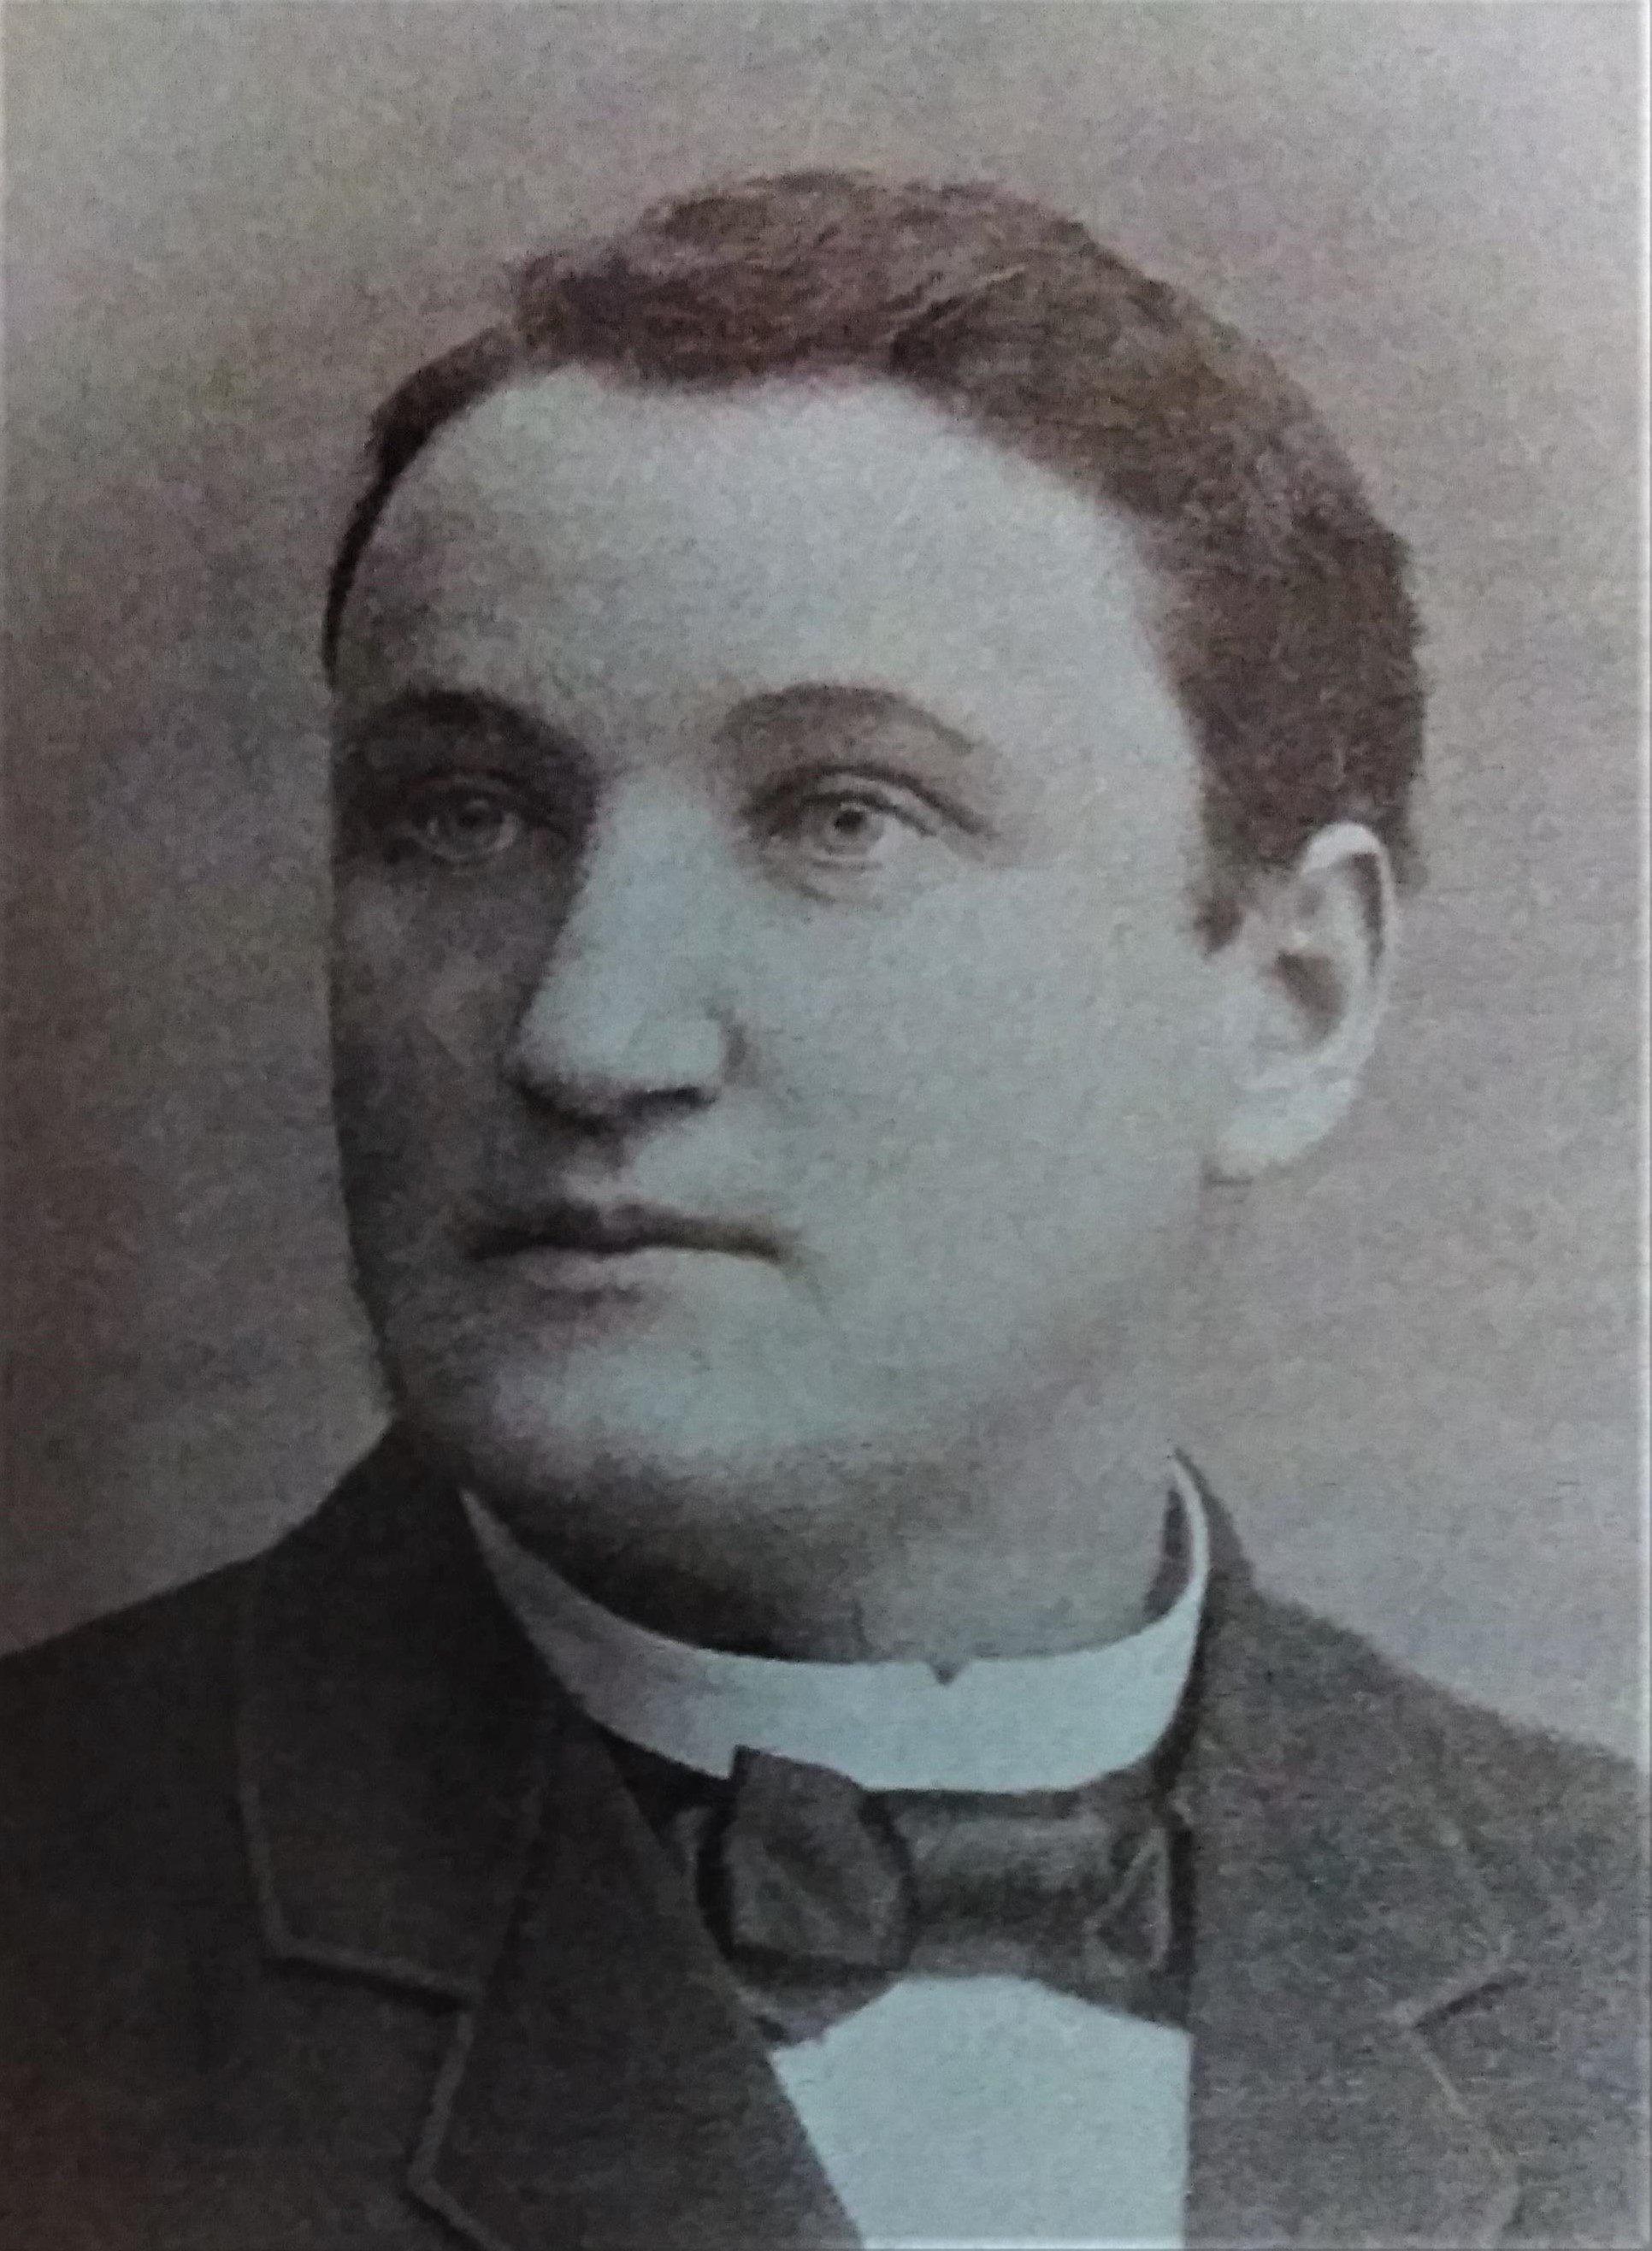 Bennion, Ira Wainwright